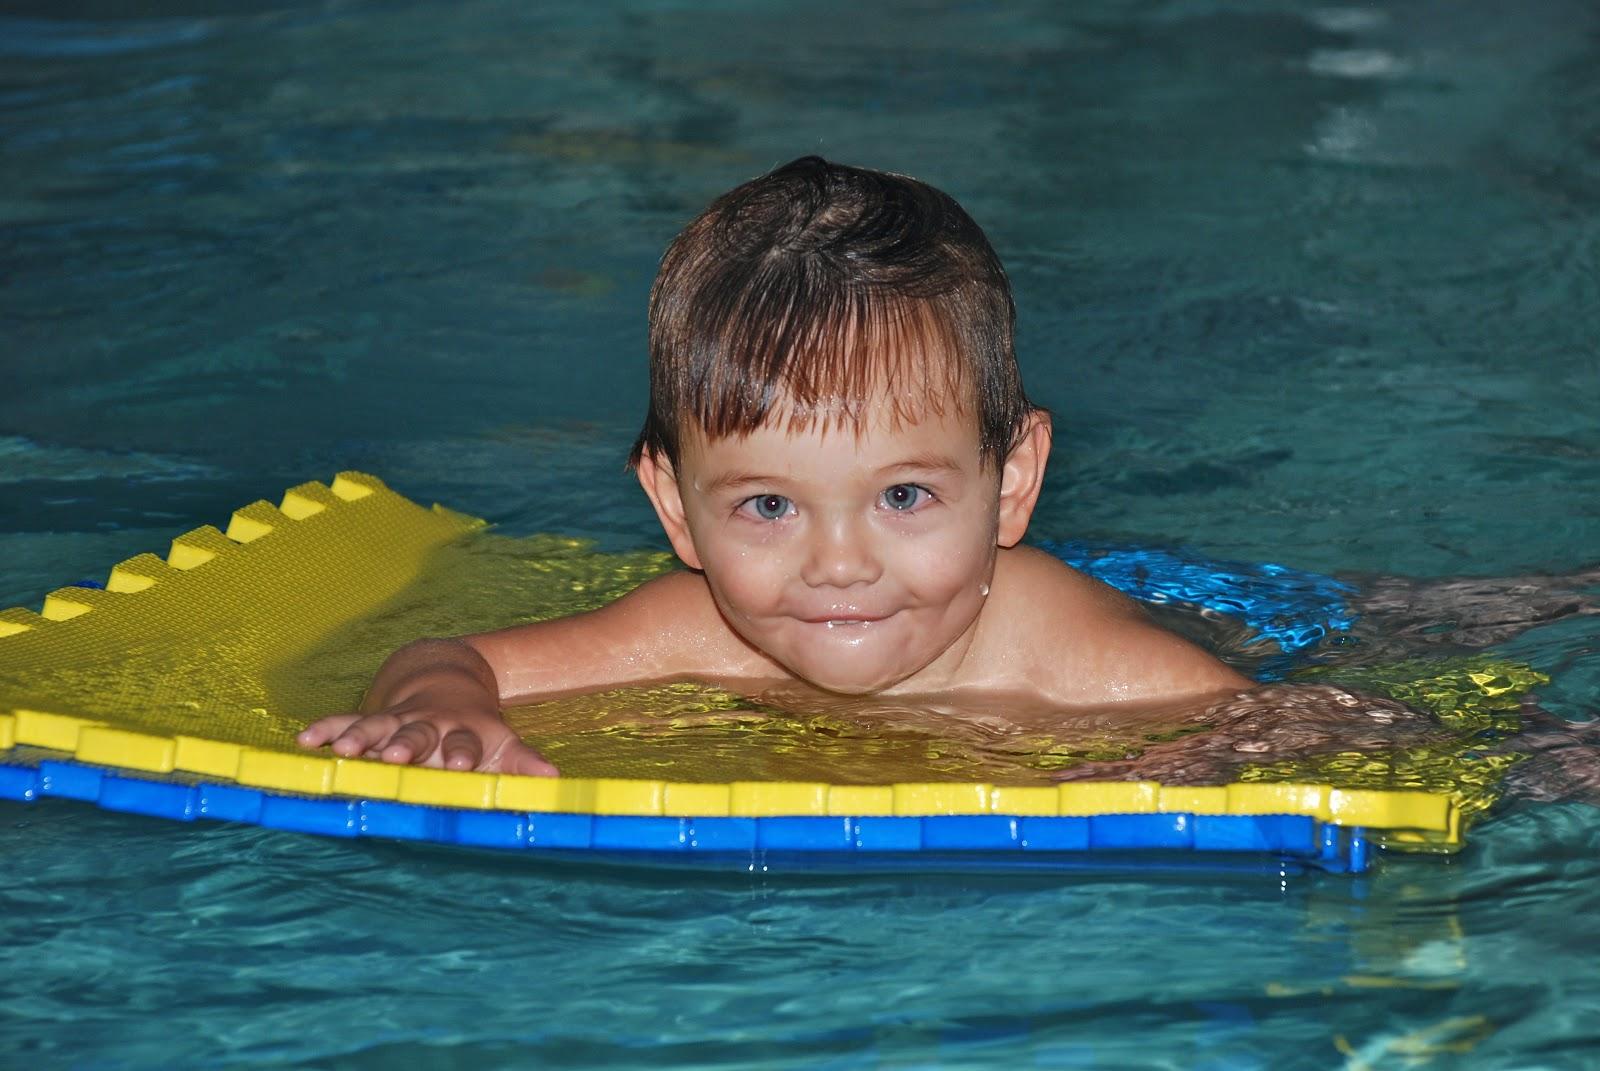 Deep blue swim school kids swimming lessons near seal beach - Swimming lessons indoor pool near me ...